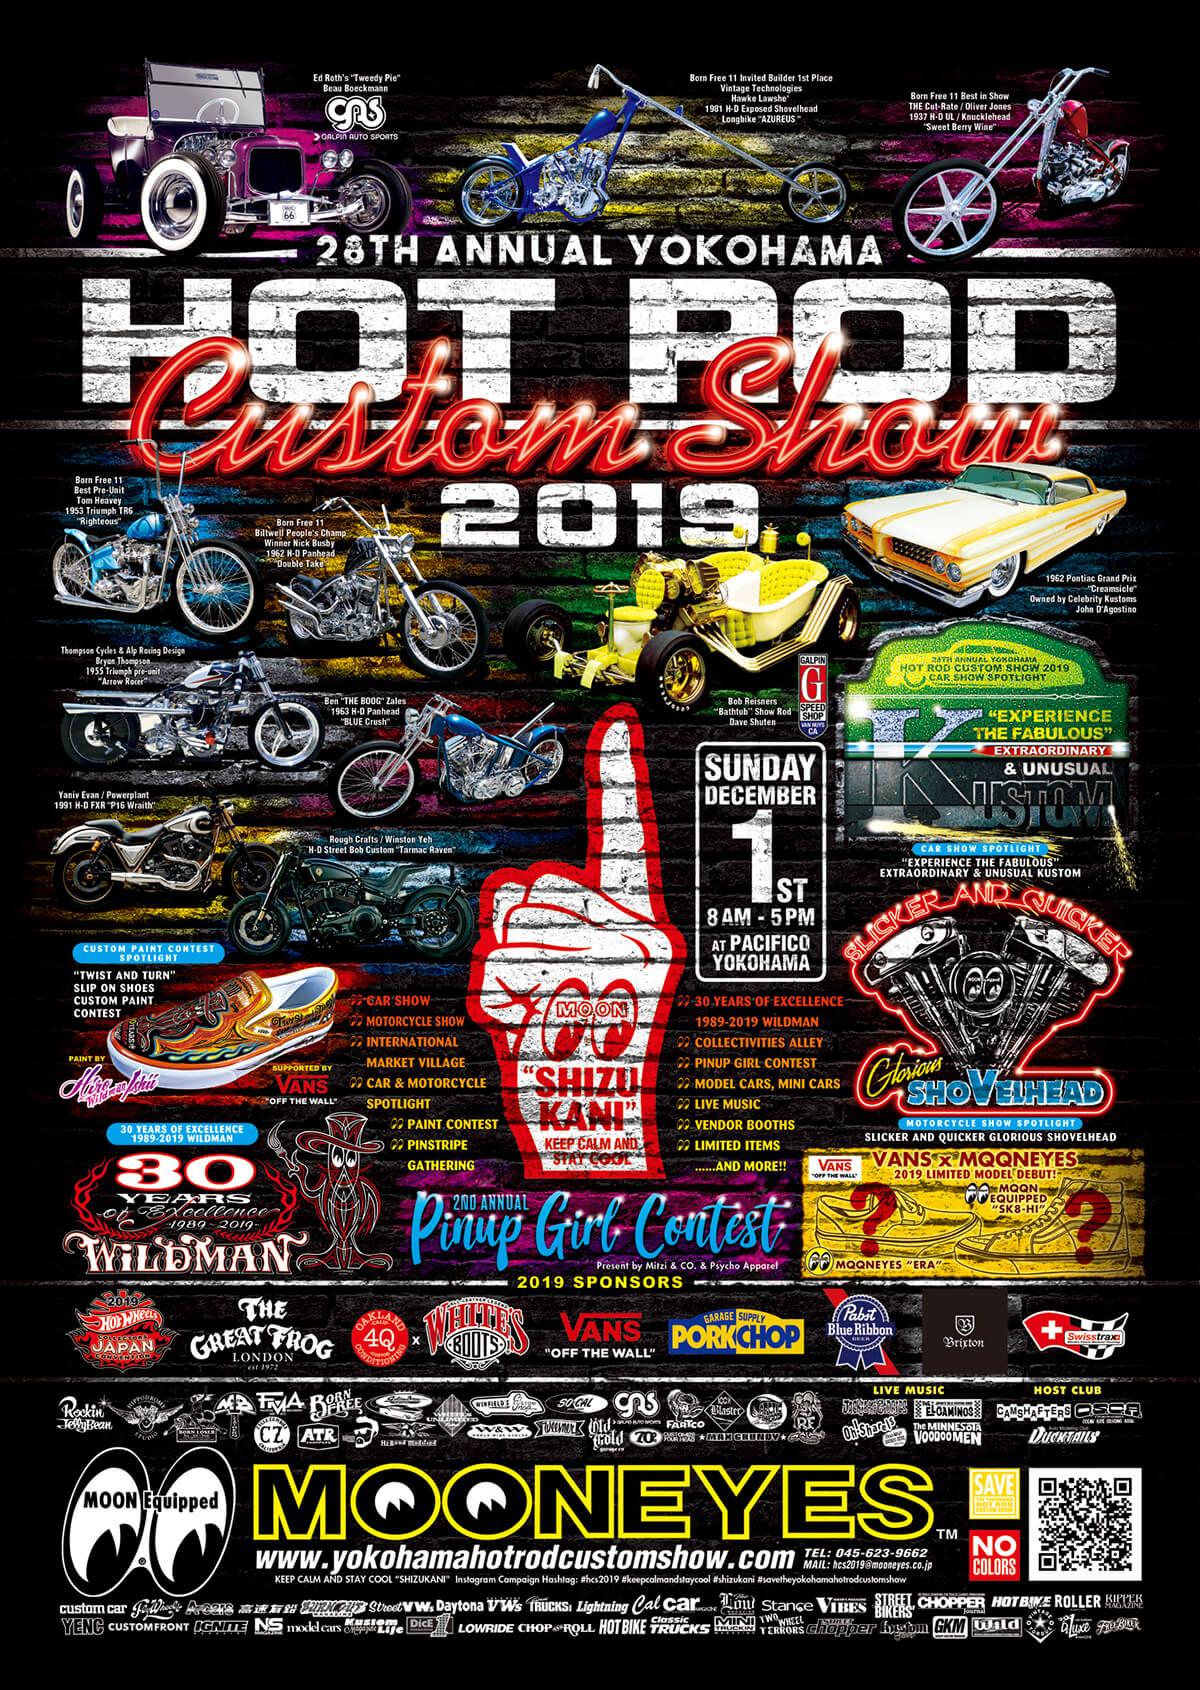 Yokohama Hot Rod Custom Show 2019